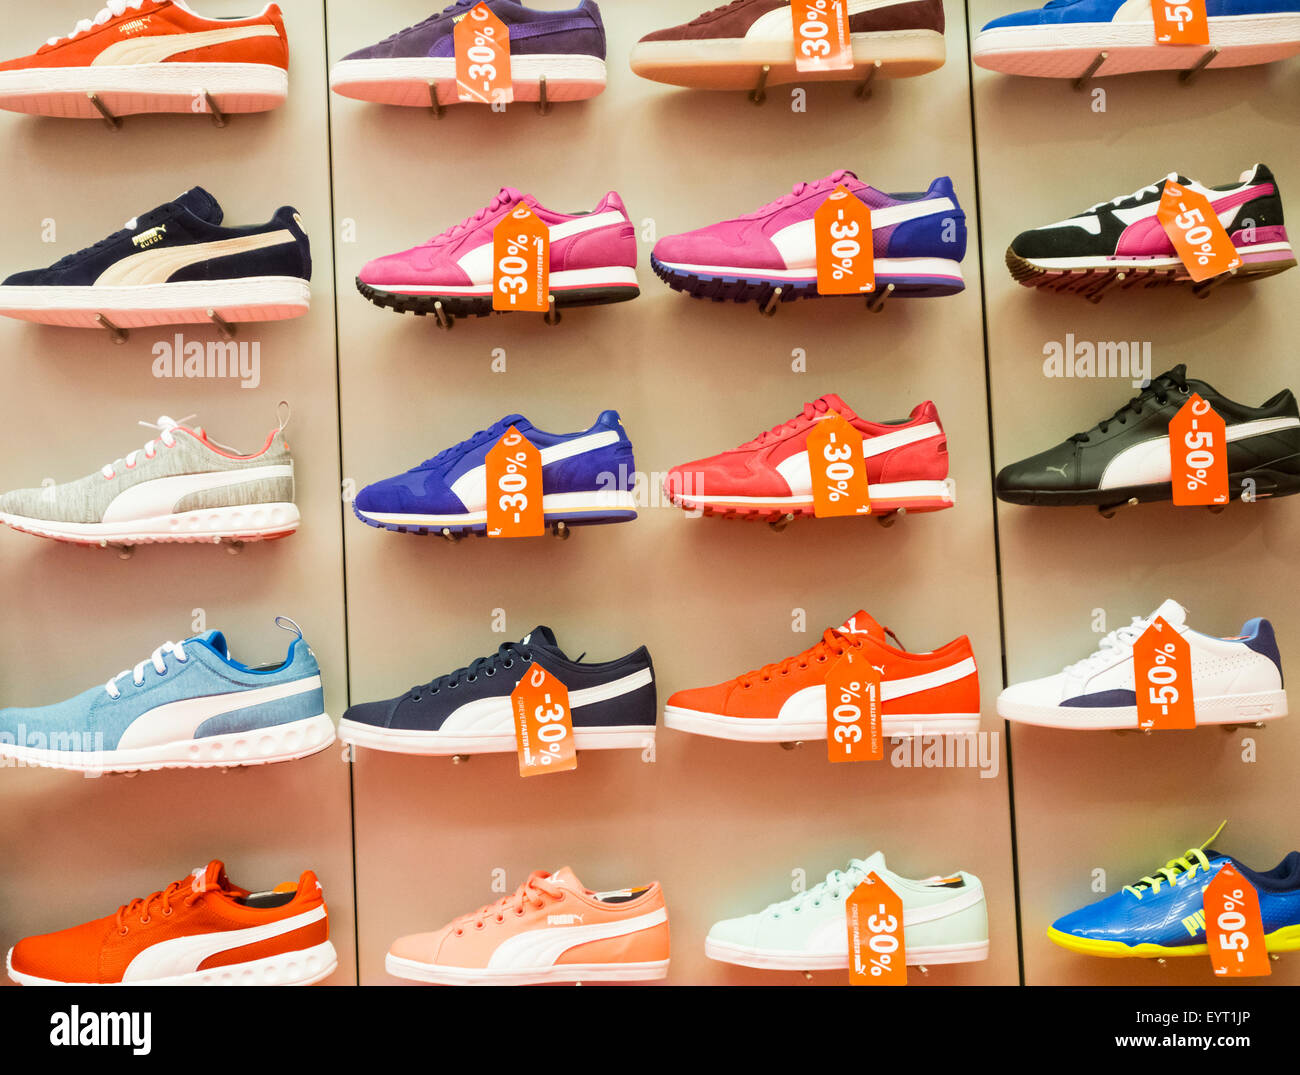 PUMA Schuhe training anzeigen im Sportgeschäft